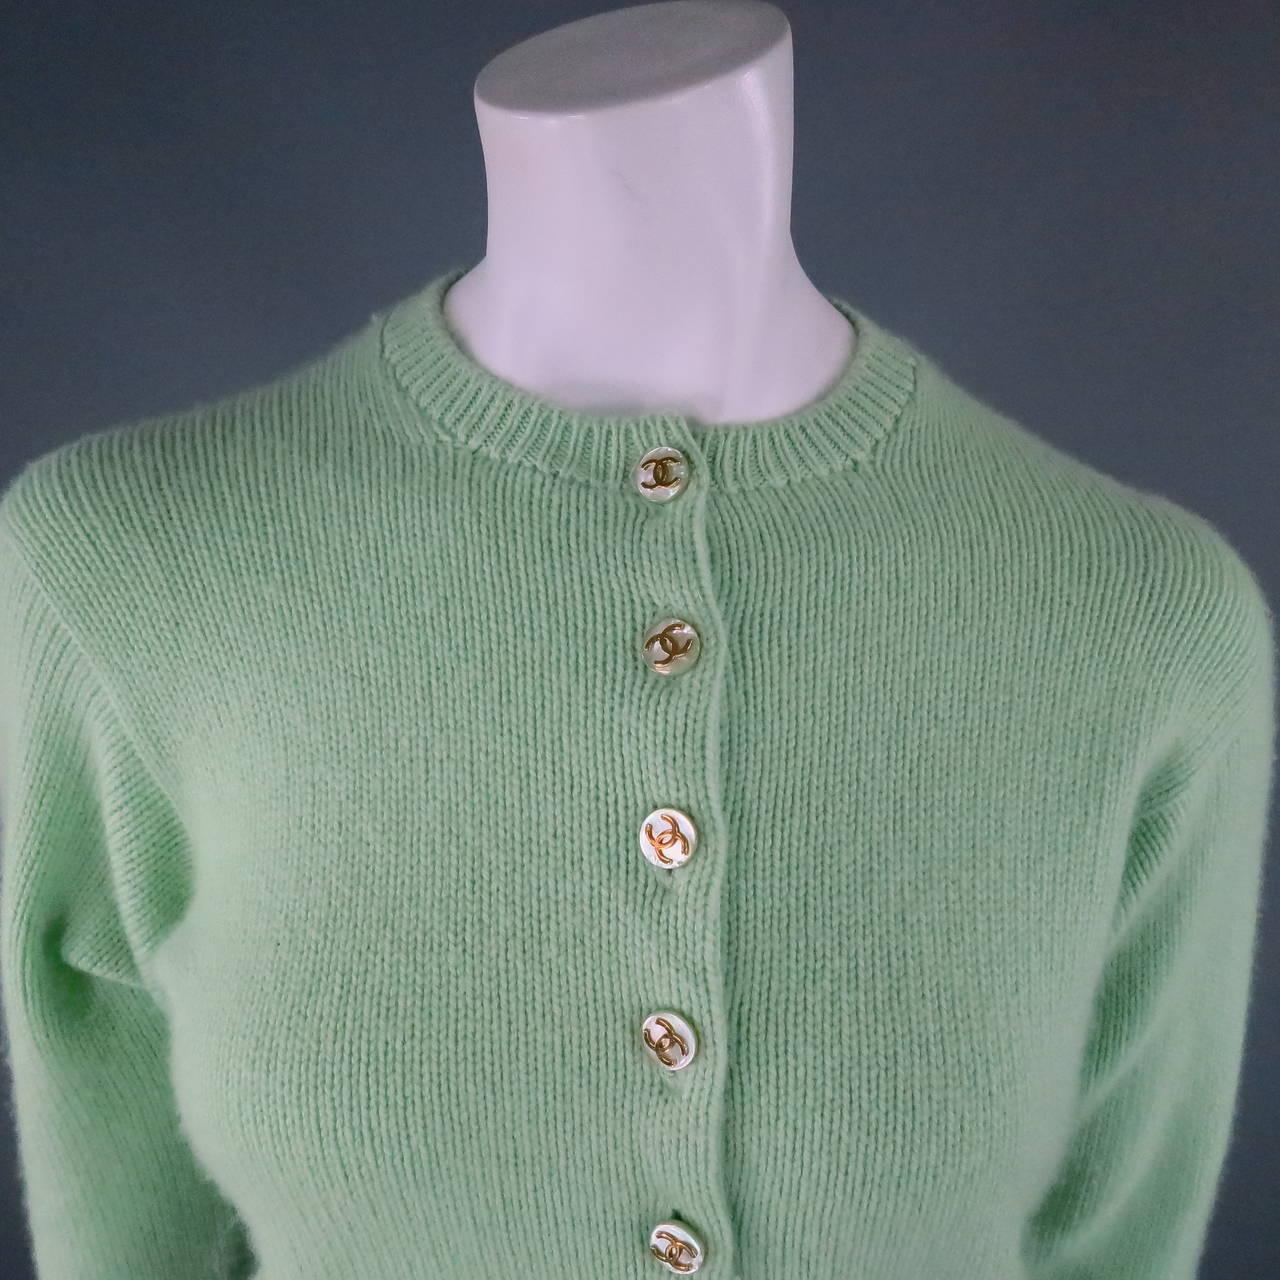 Vintage CHANEL Size M Mint Green Cashmere Cardigan 4